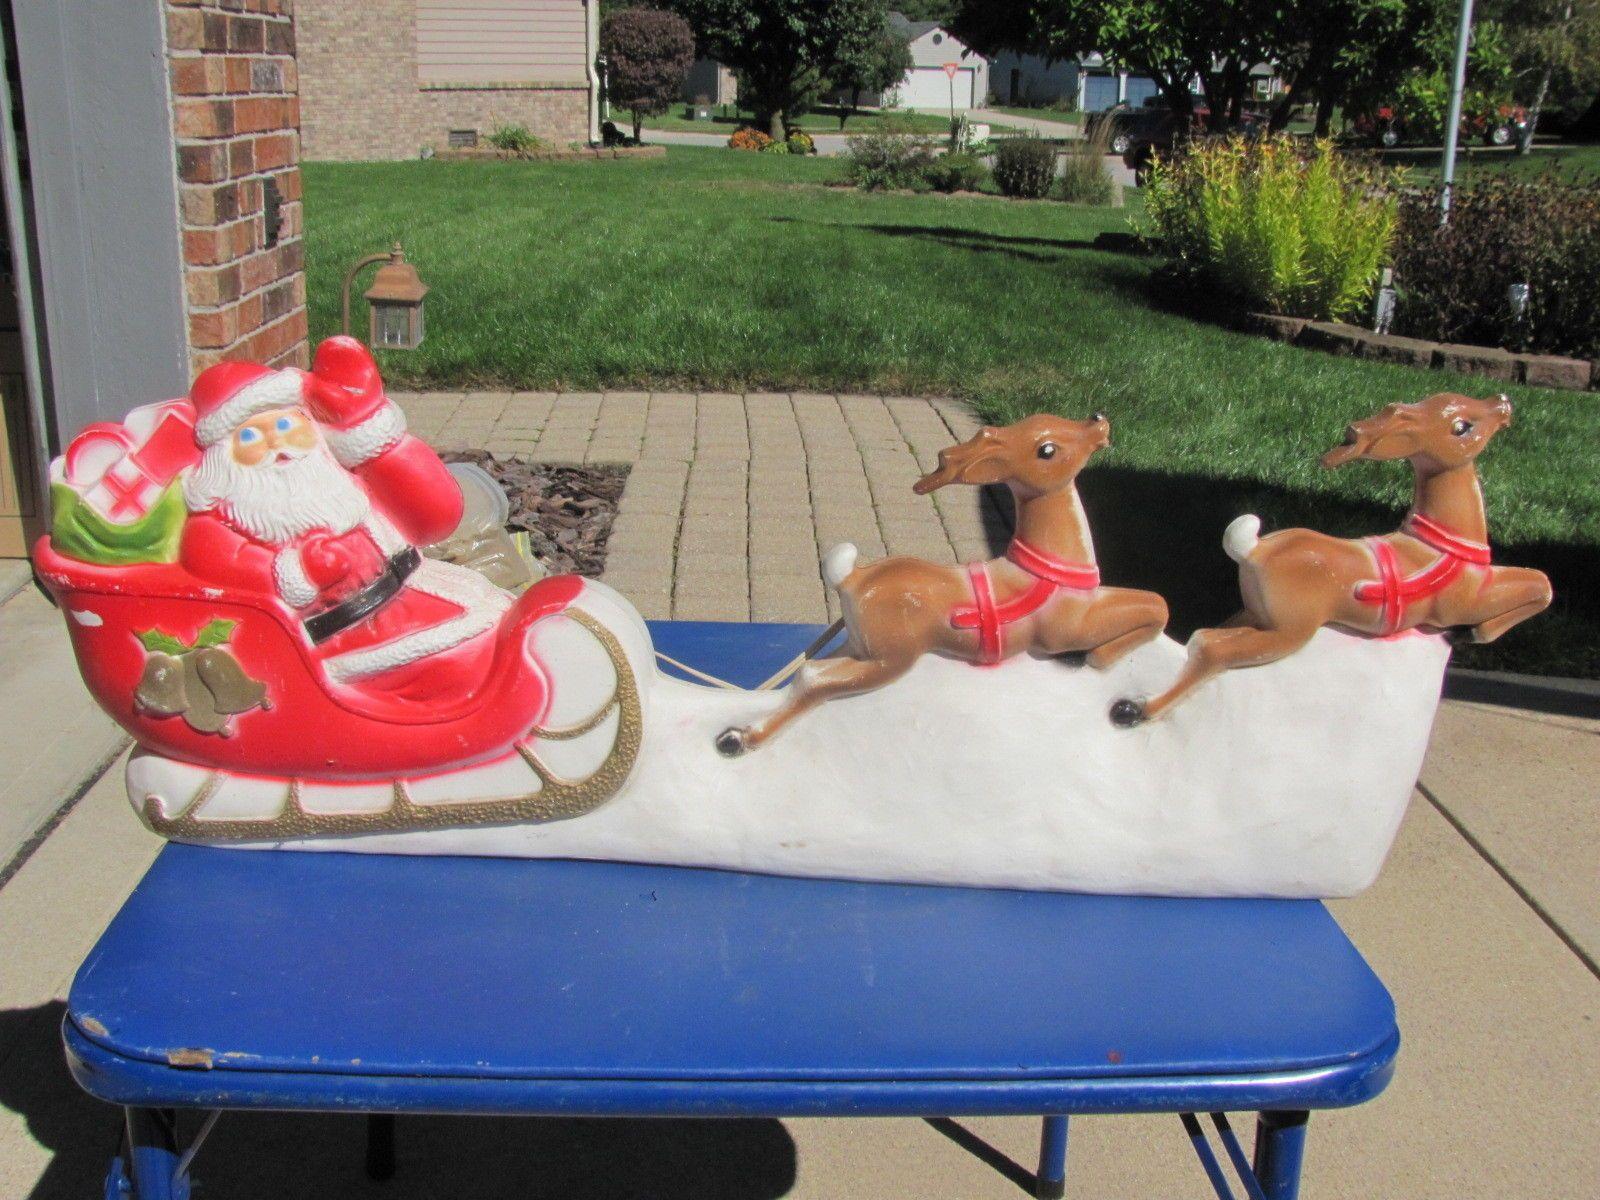 Union Santa Sleigh Reindeer Xmas Blowmold Light Plastic Outdoor Decor Yard VTG | eBay